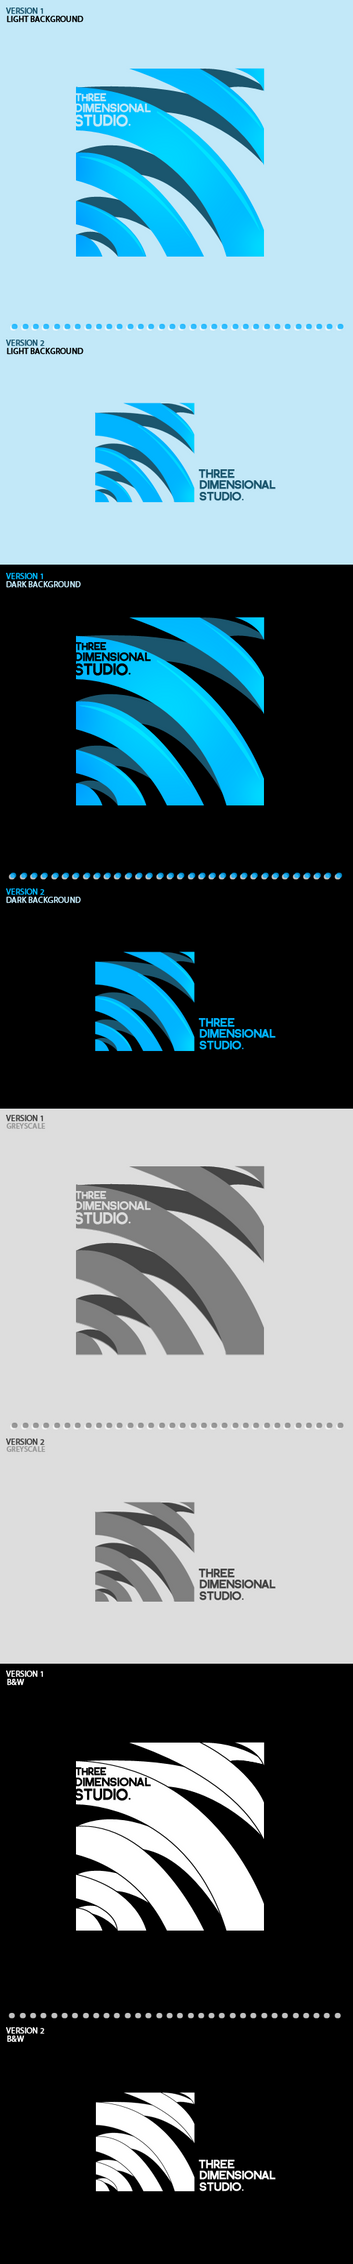 Three Dimensional Studio by TenTypMatias